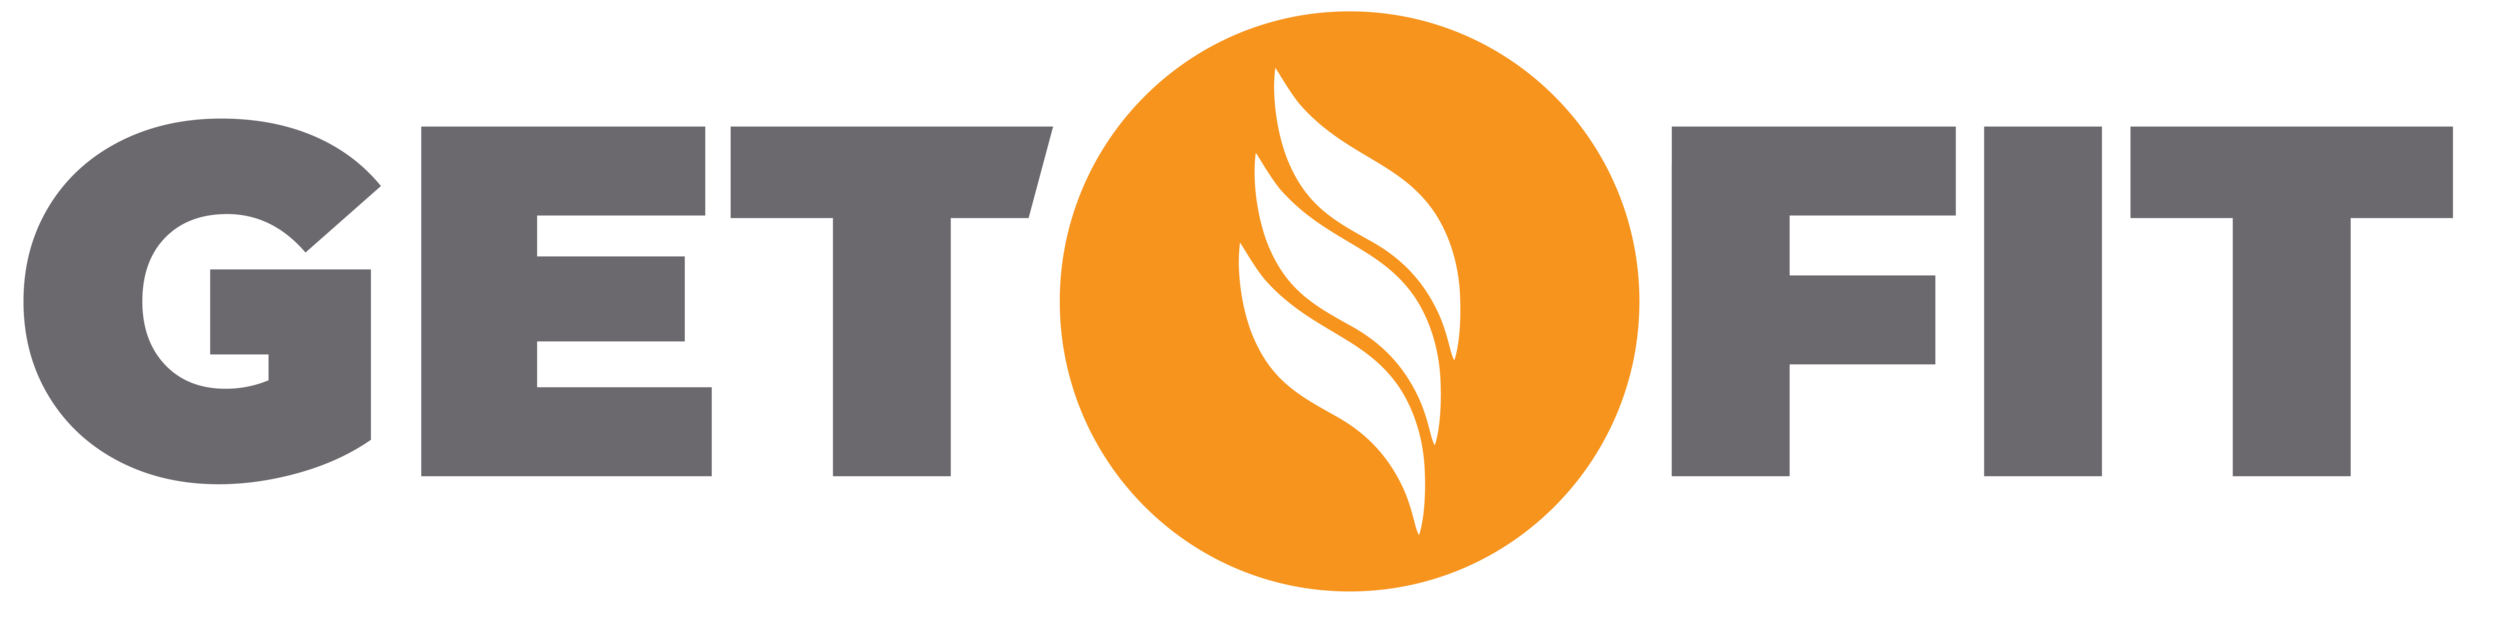 GetFit-Logo-01.png